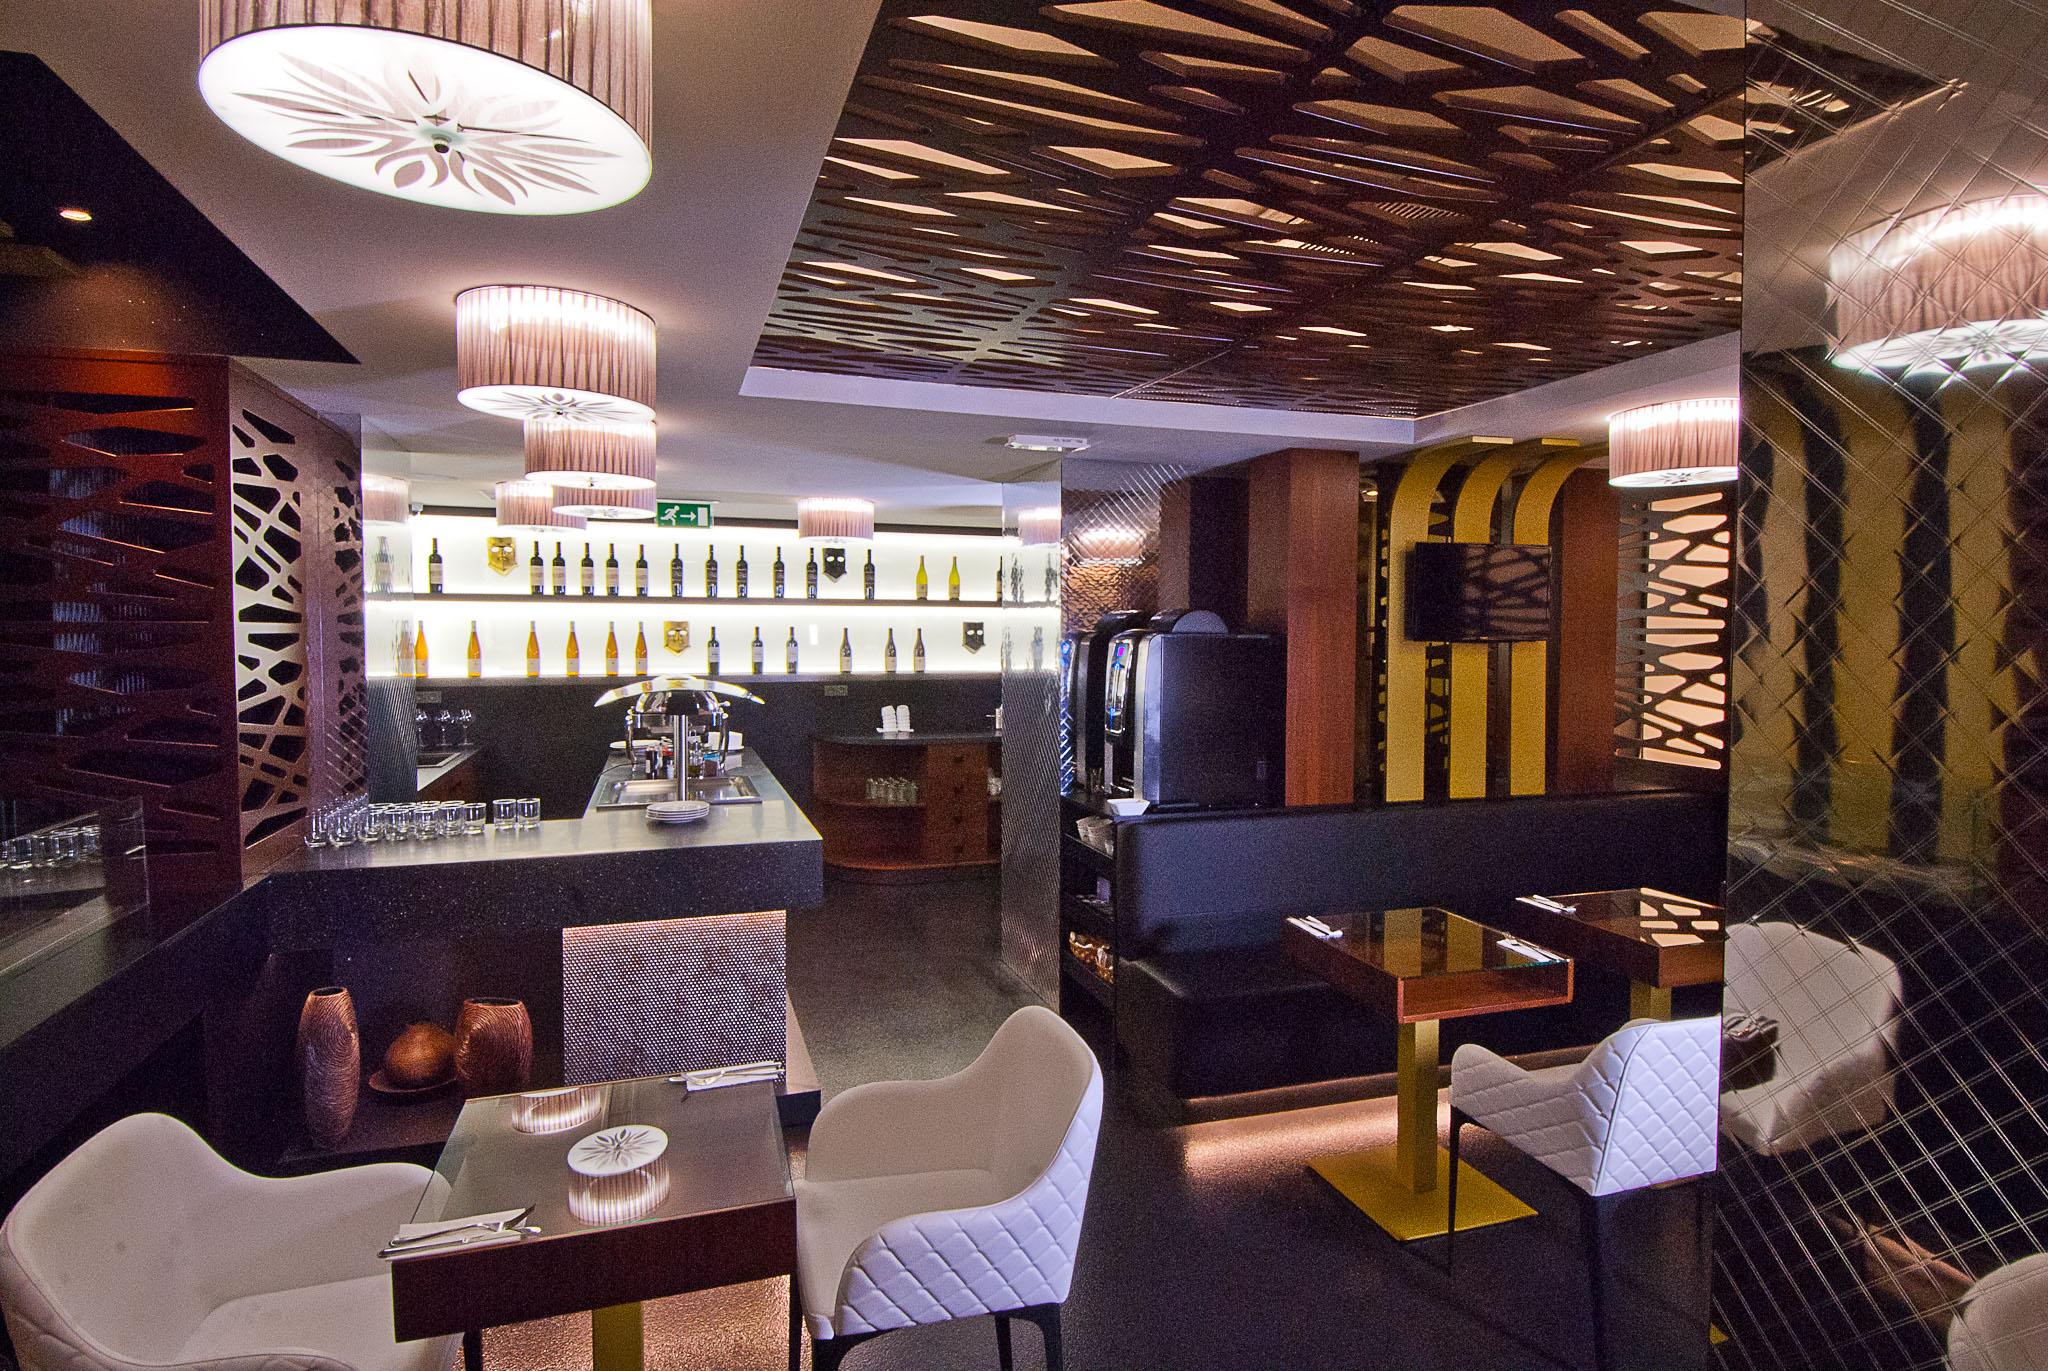 hotel-mysterius-wranovsky-crystal-chandeliers-6.jpg